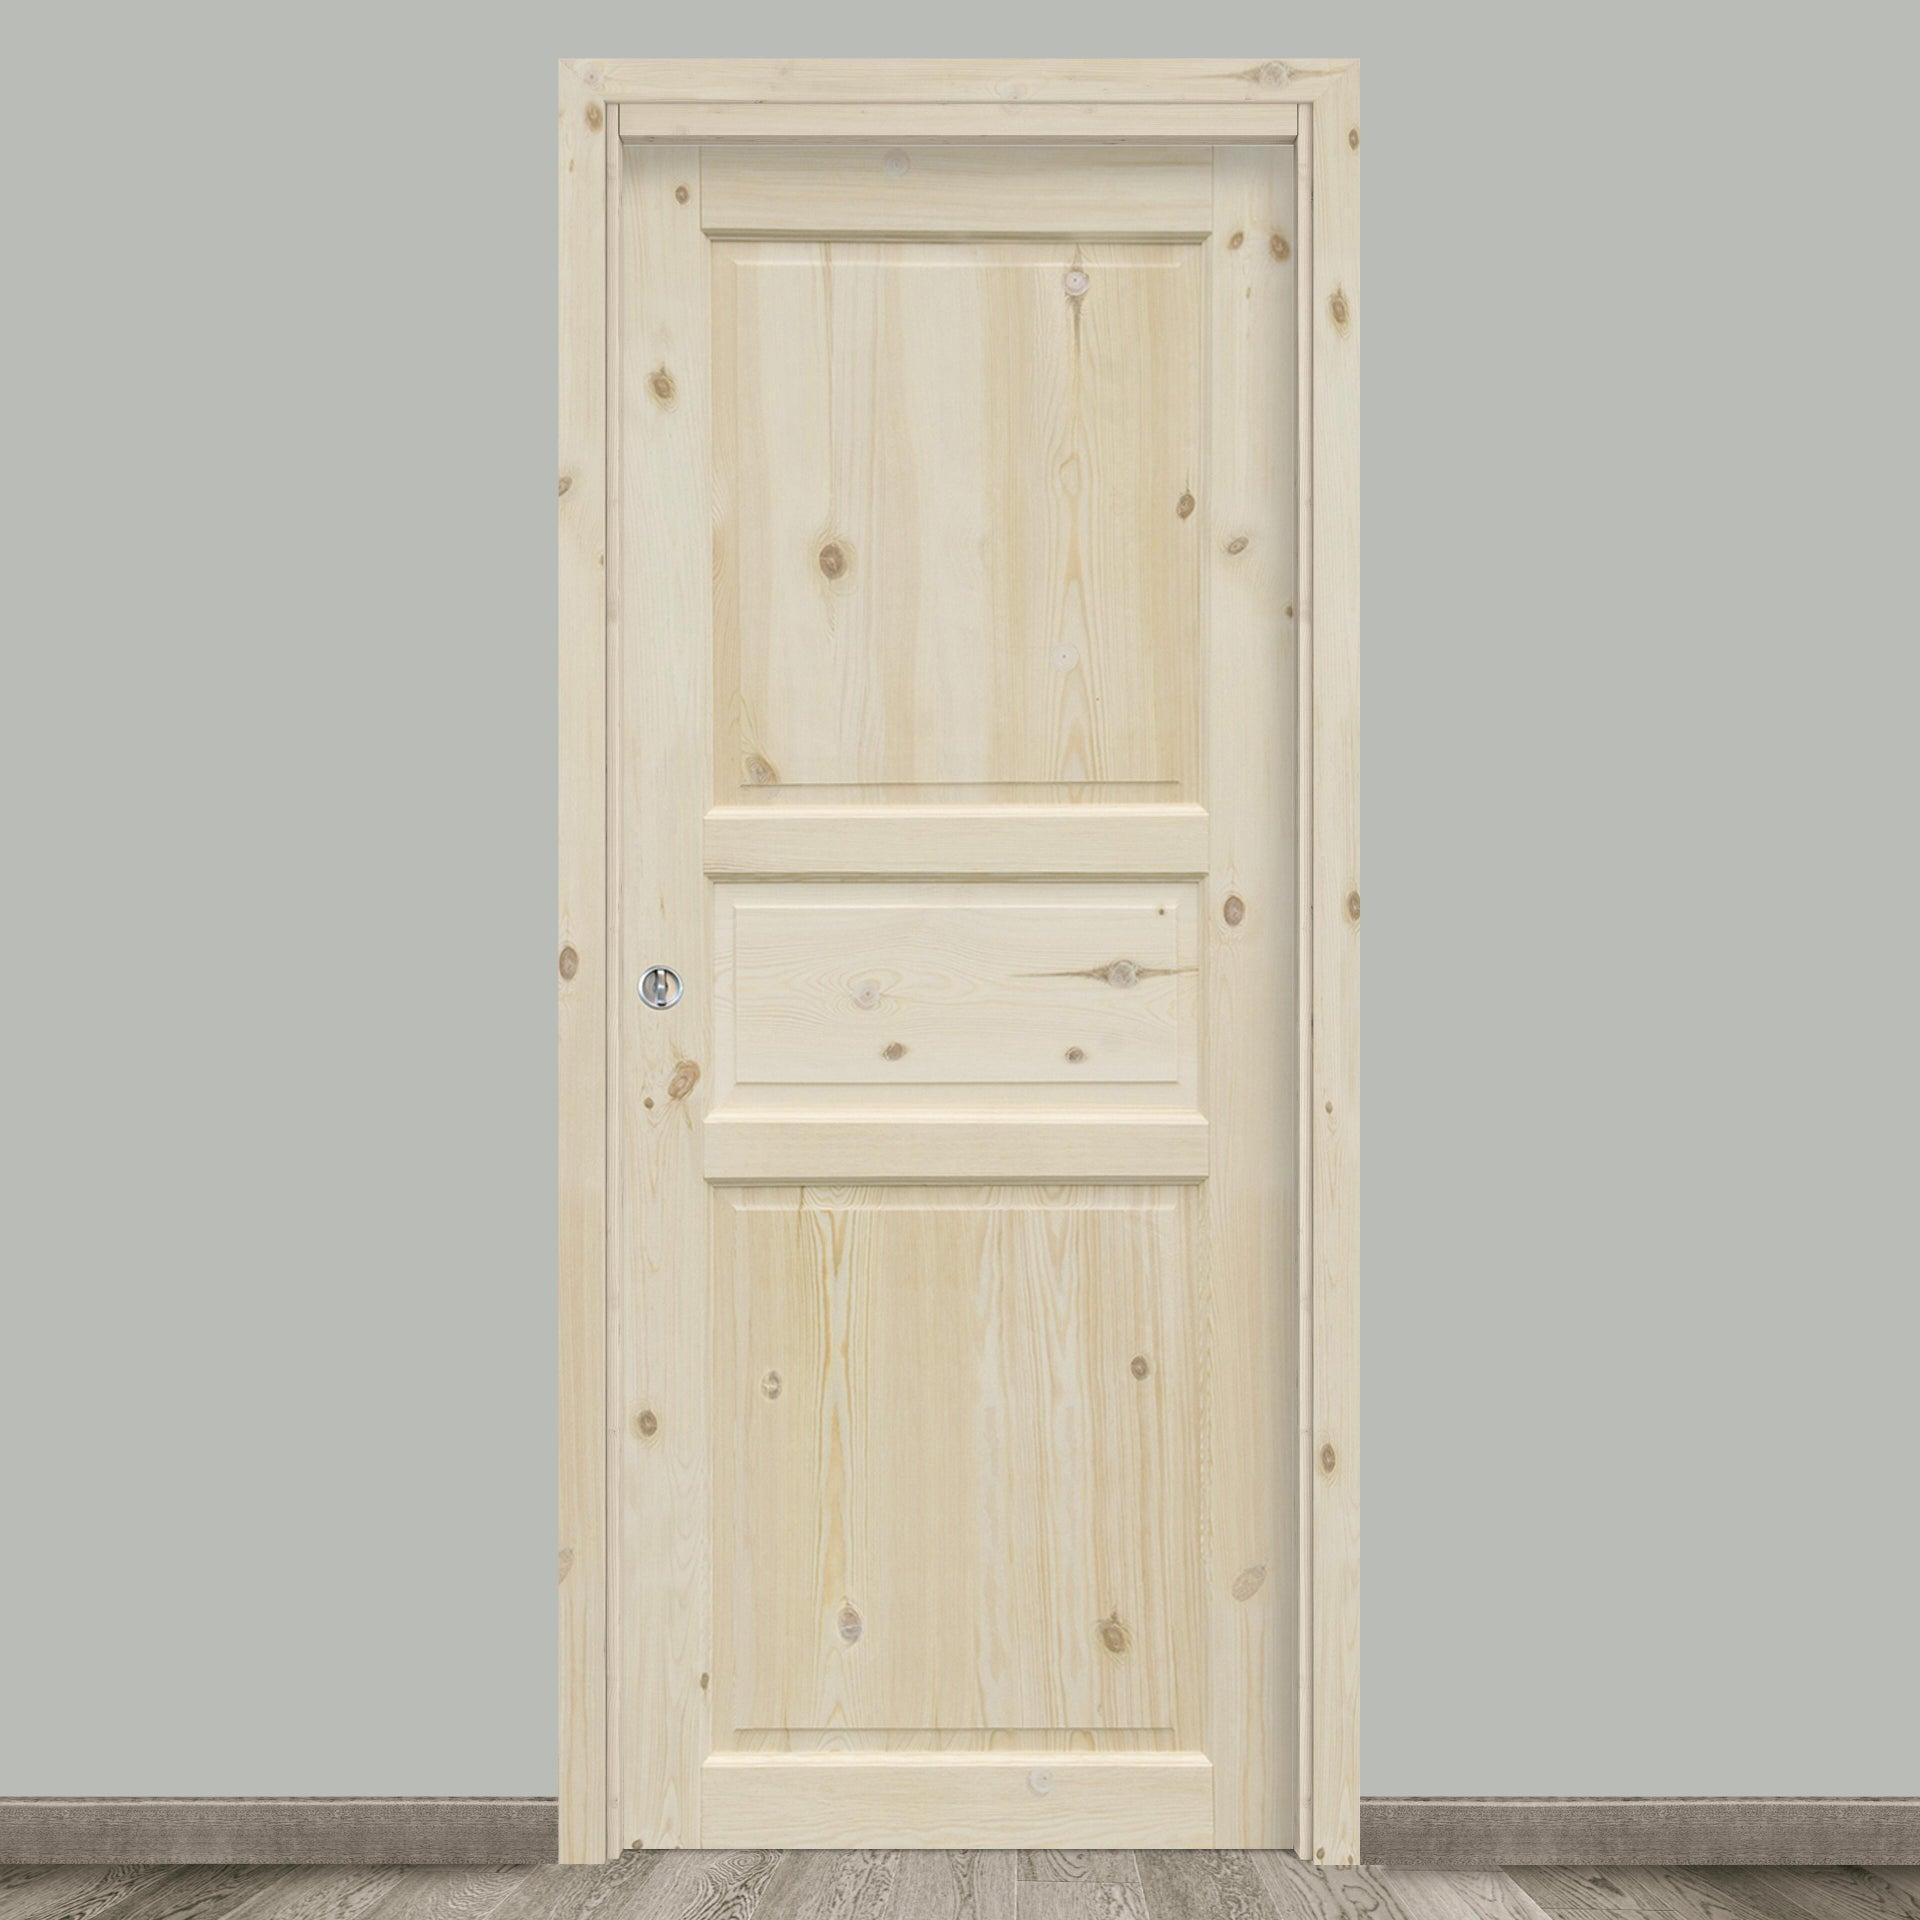 Porta scorrevole a scomparsa Acul naturale L 70 x H 210 cm reversibile - 1